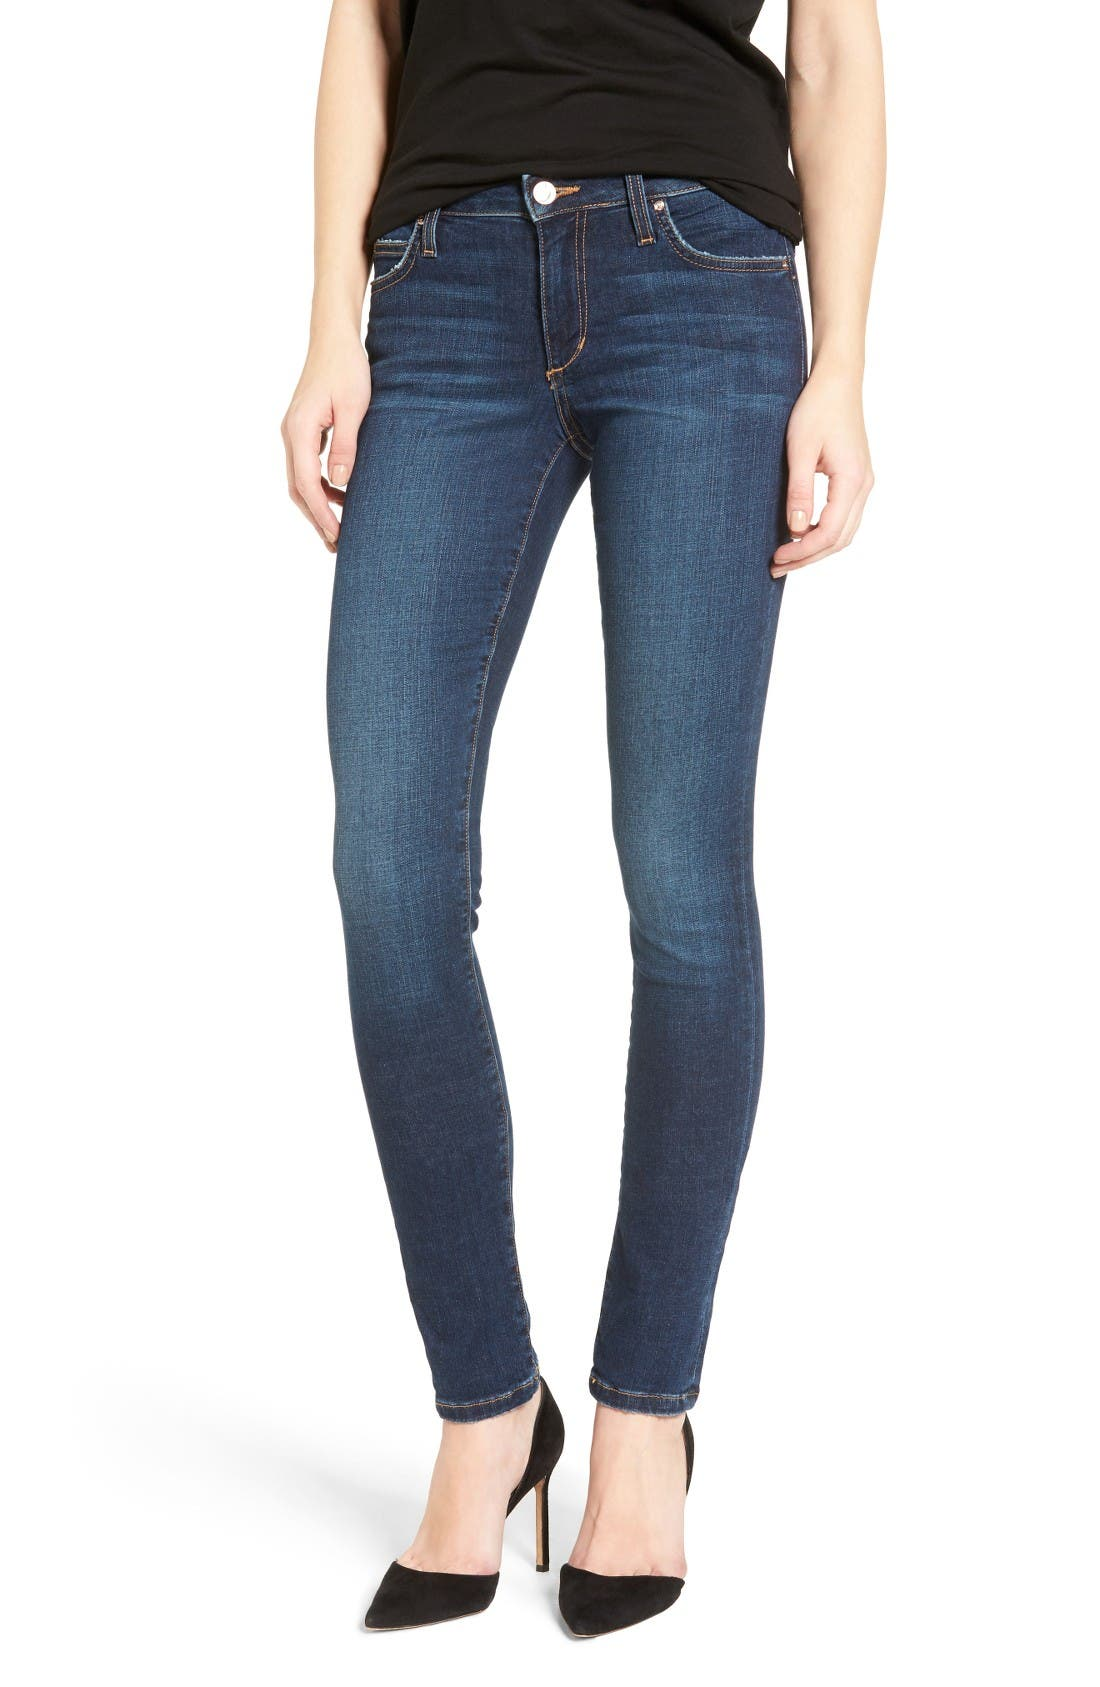 Alternate Image 1 Selected - Joe's Flawless - Honey Curvy Skinny Jeans (Tania)